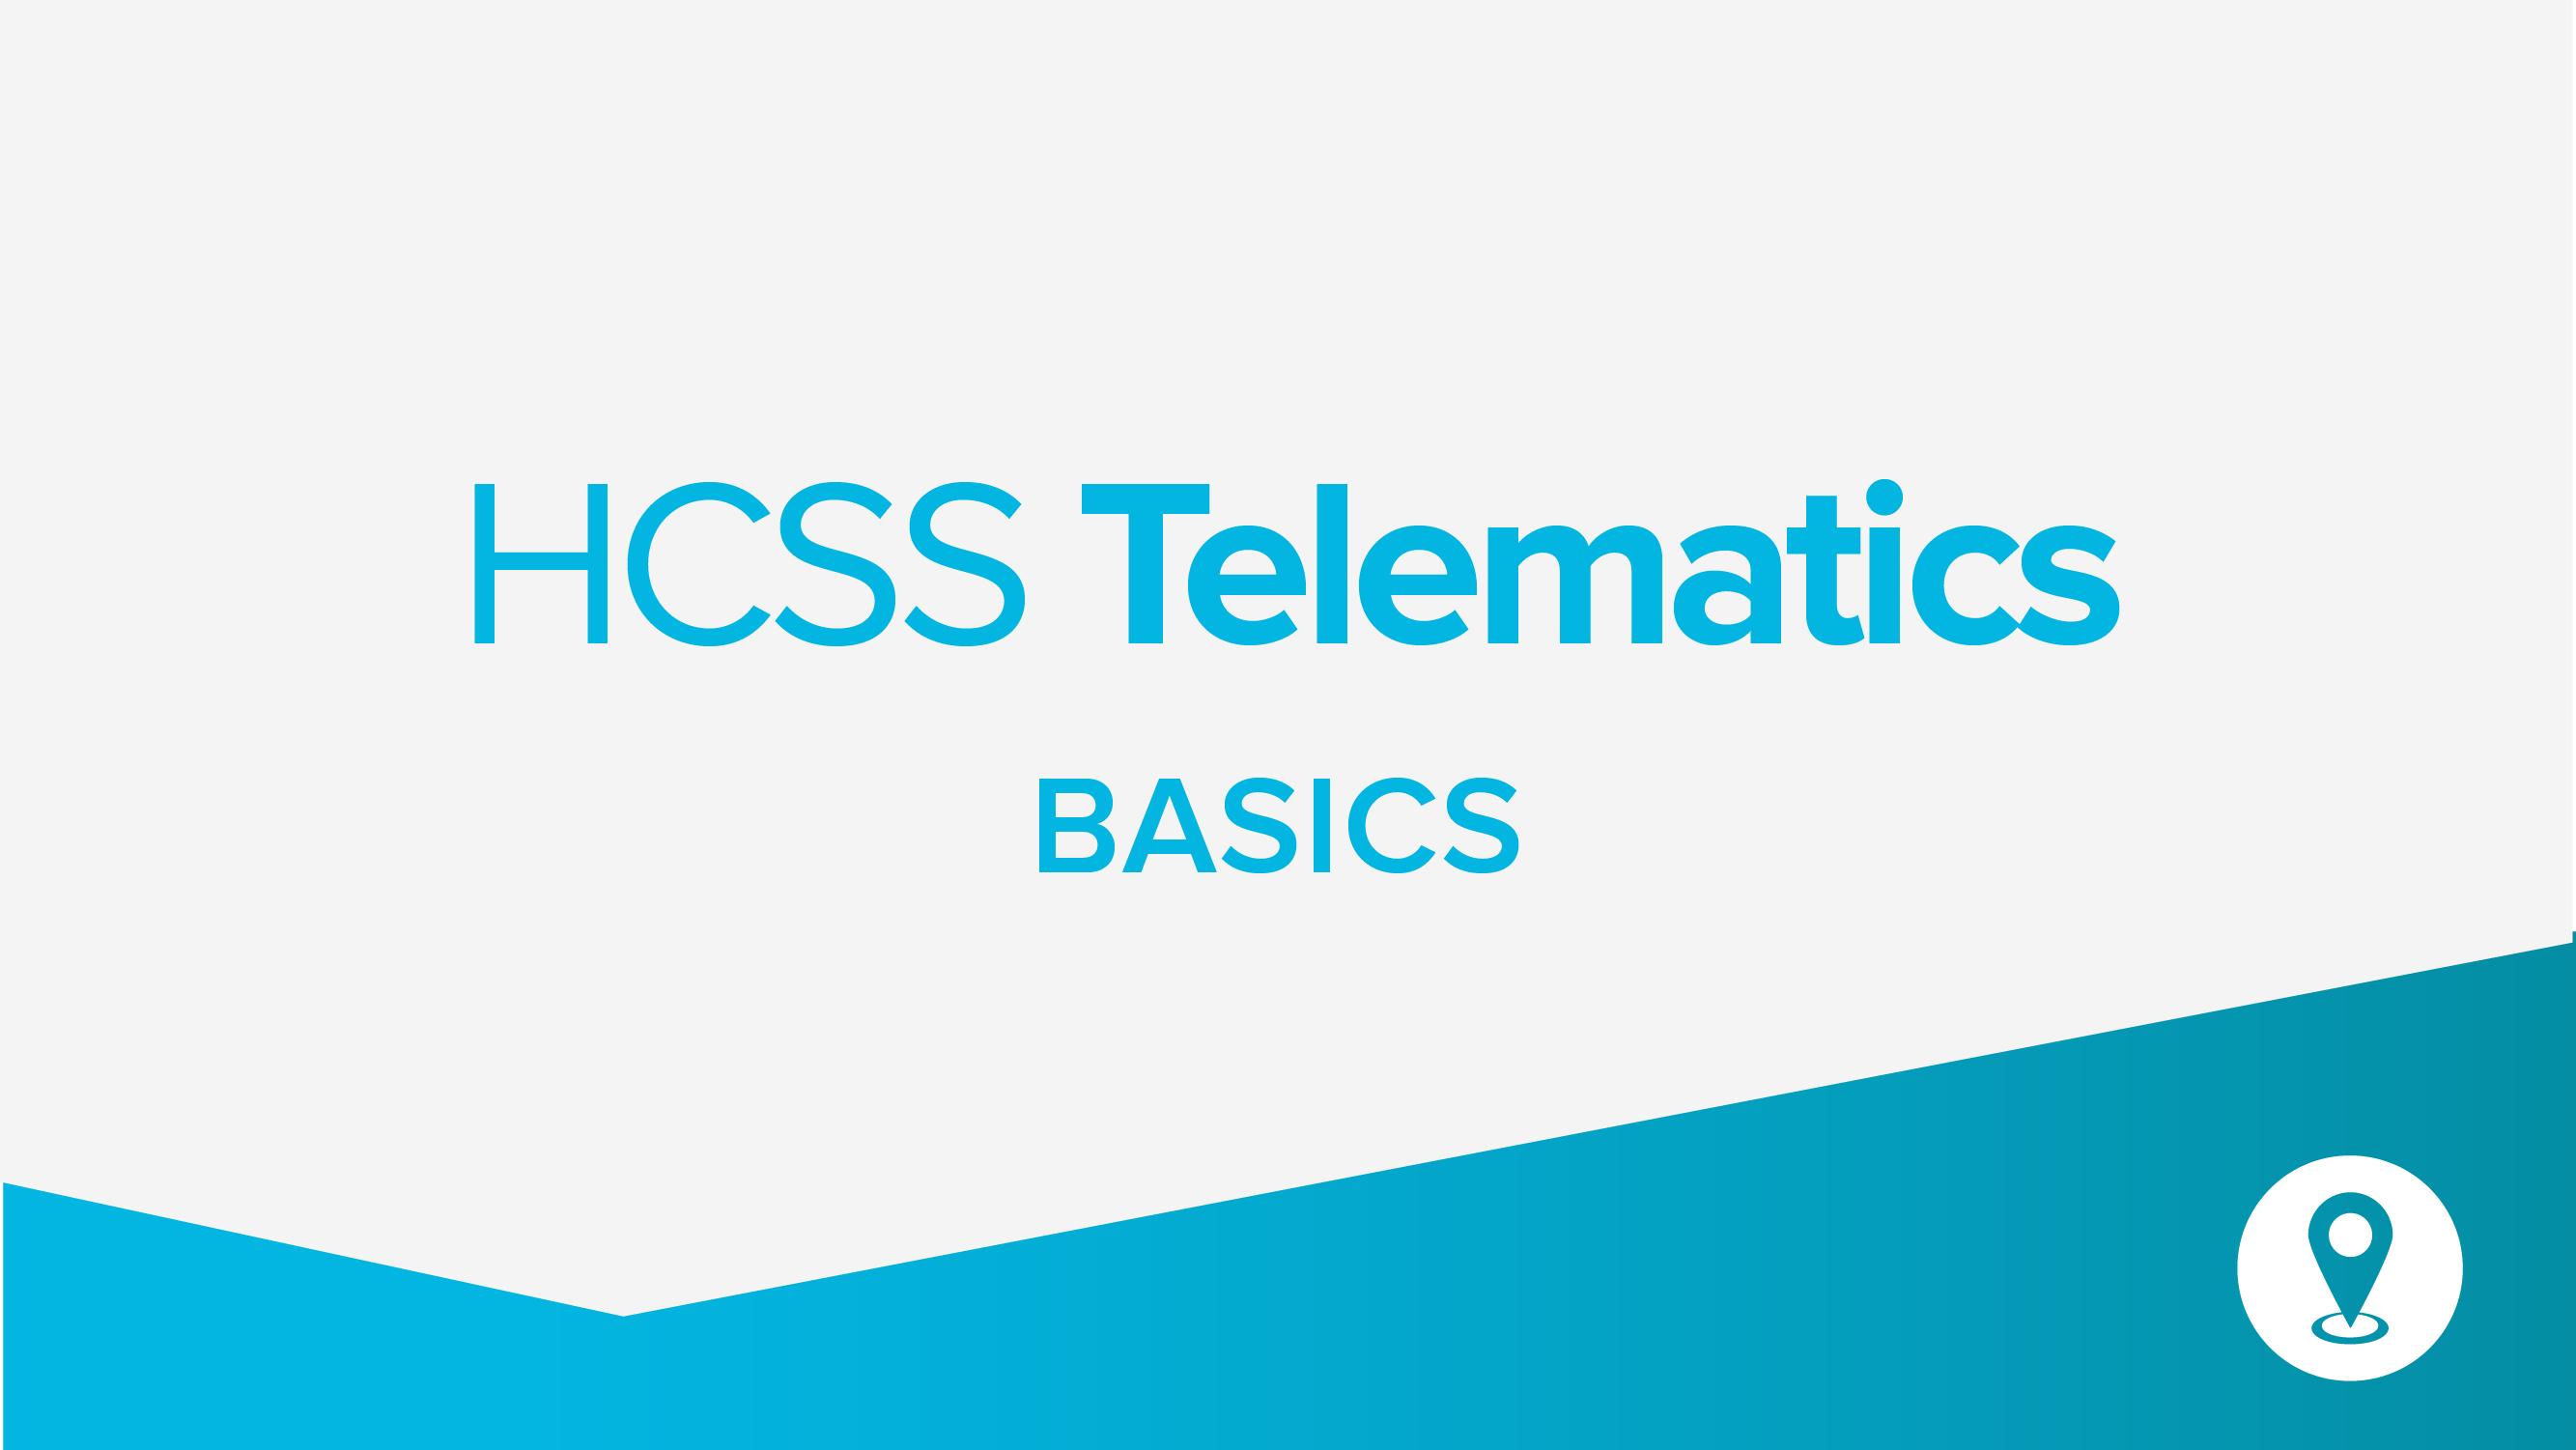 Telematics 101: Introduction to Telematics and Credentials